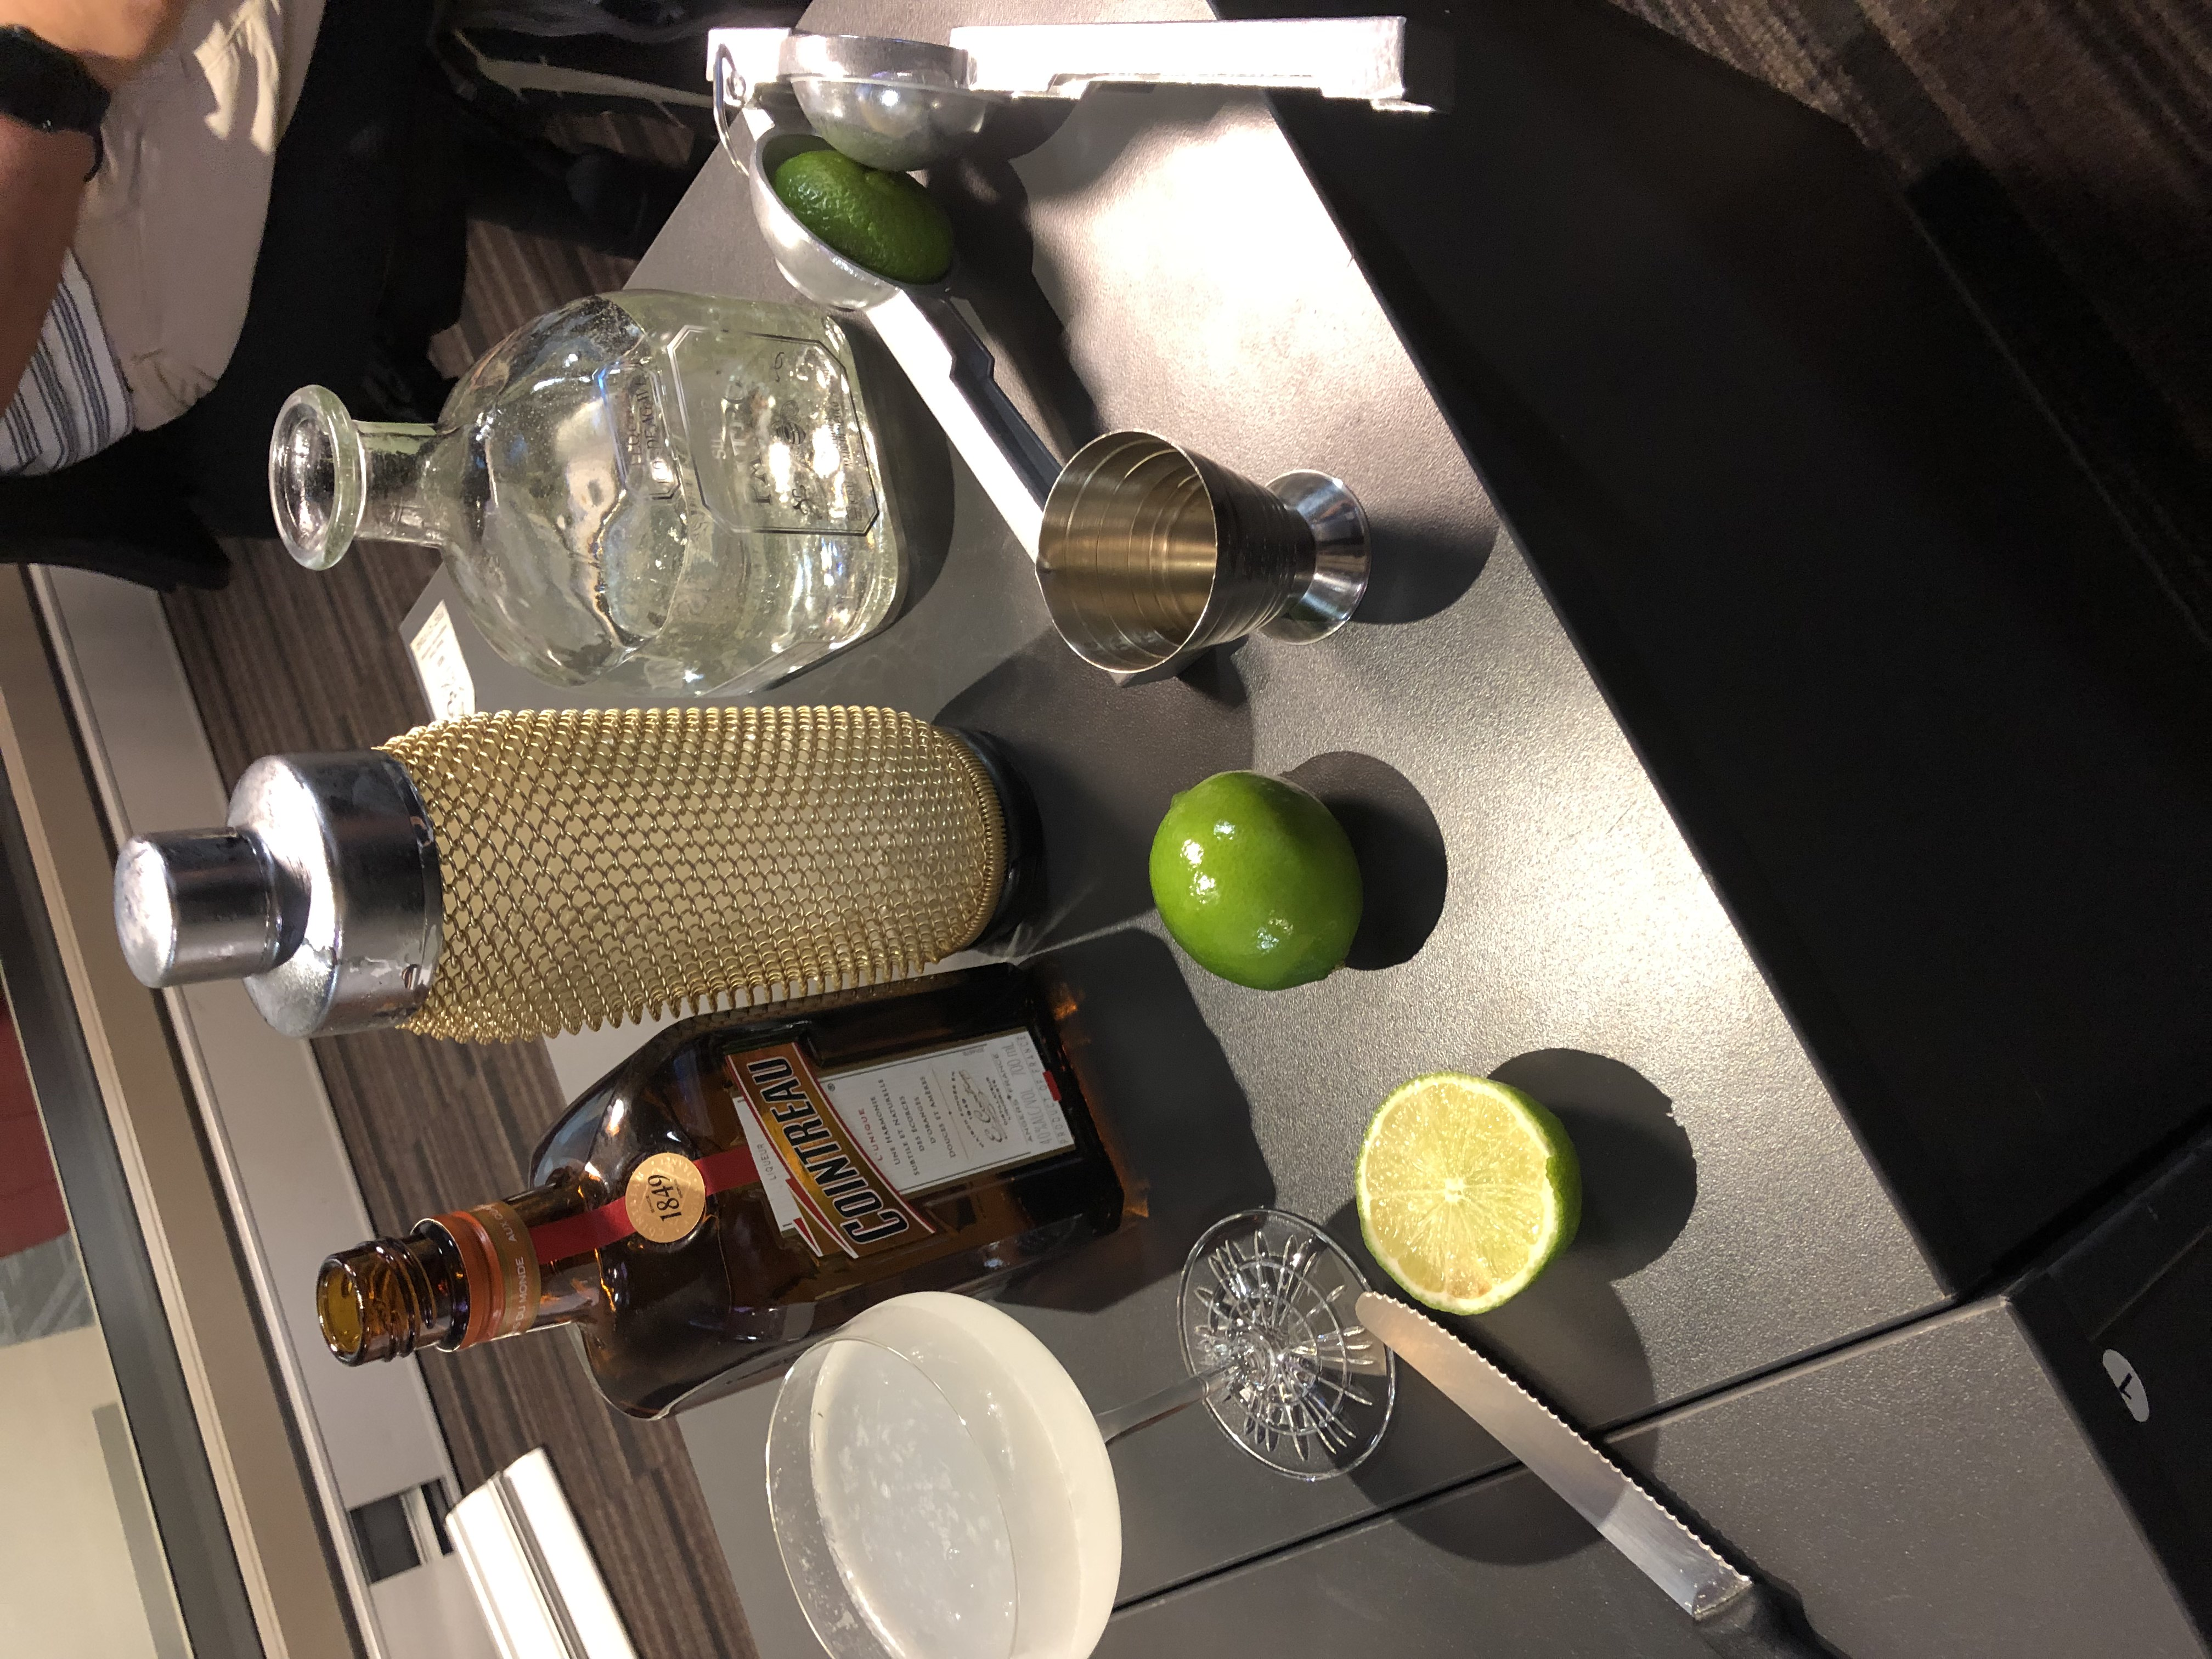 It's World Margarita Day!